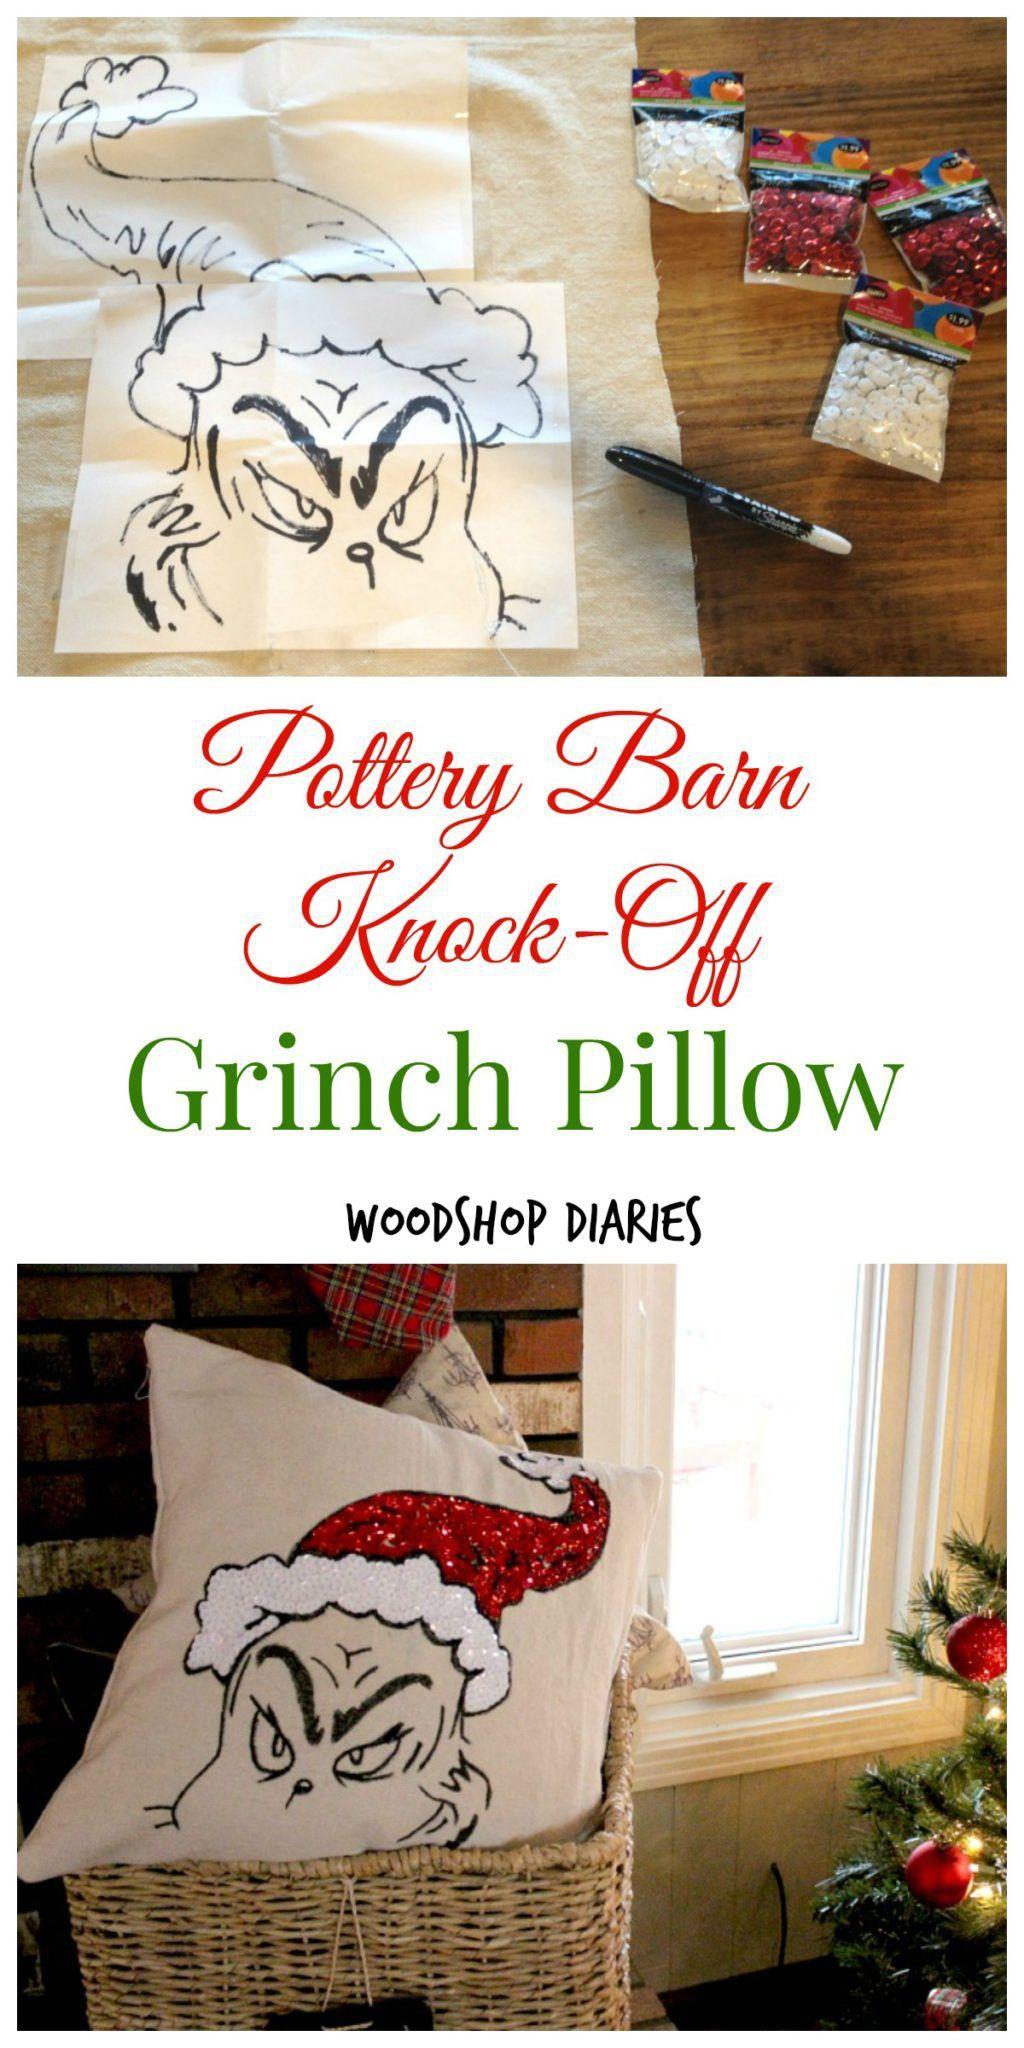 DIY Grinch Pillow--A Pottery Barn Knock-Off | Christmas | Pinterest ...